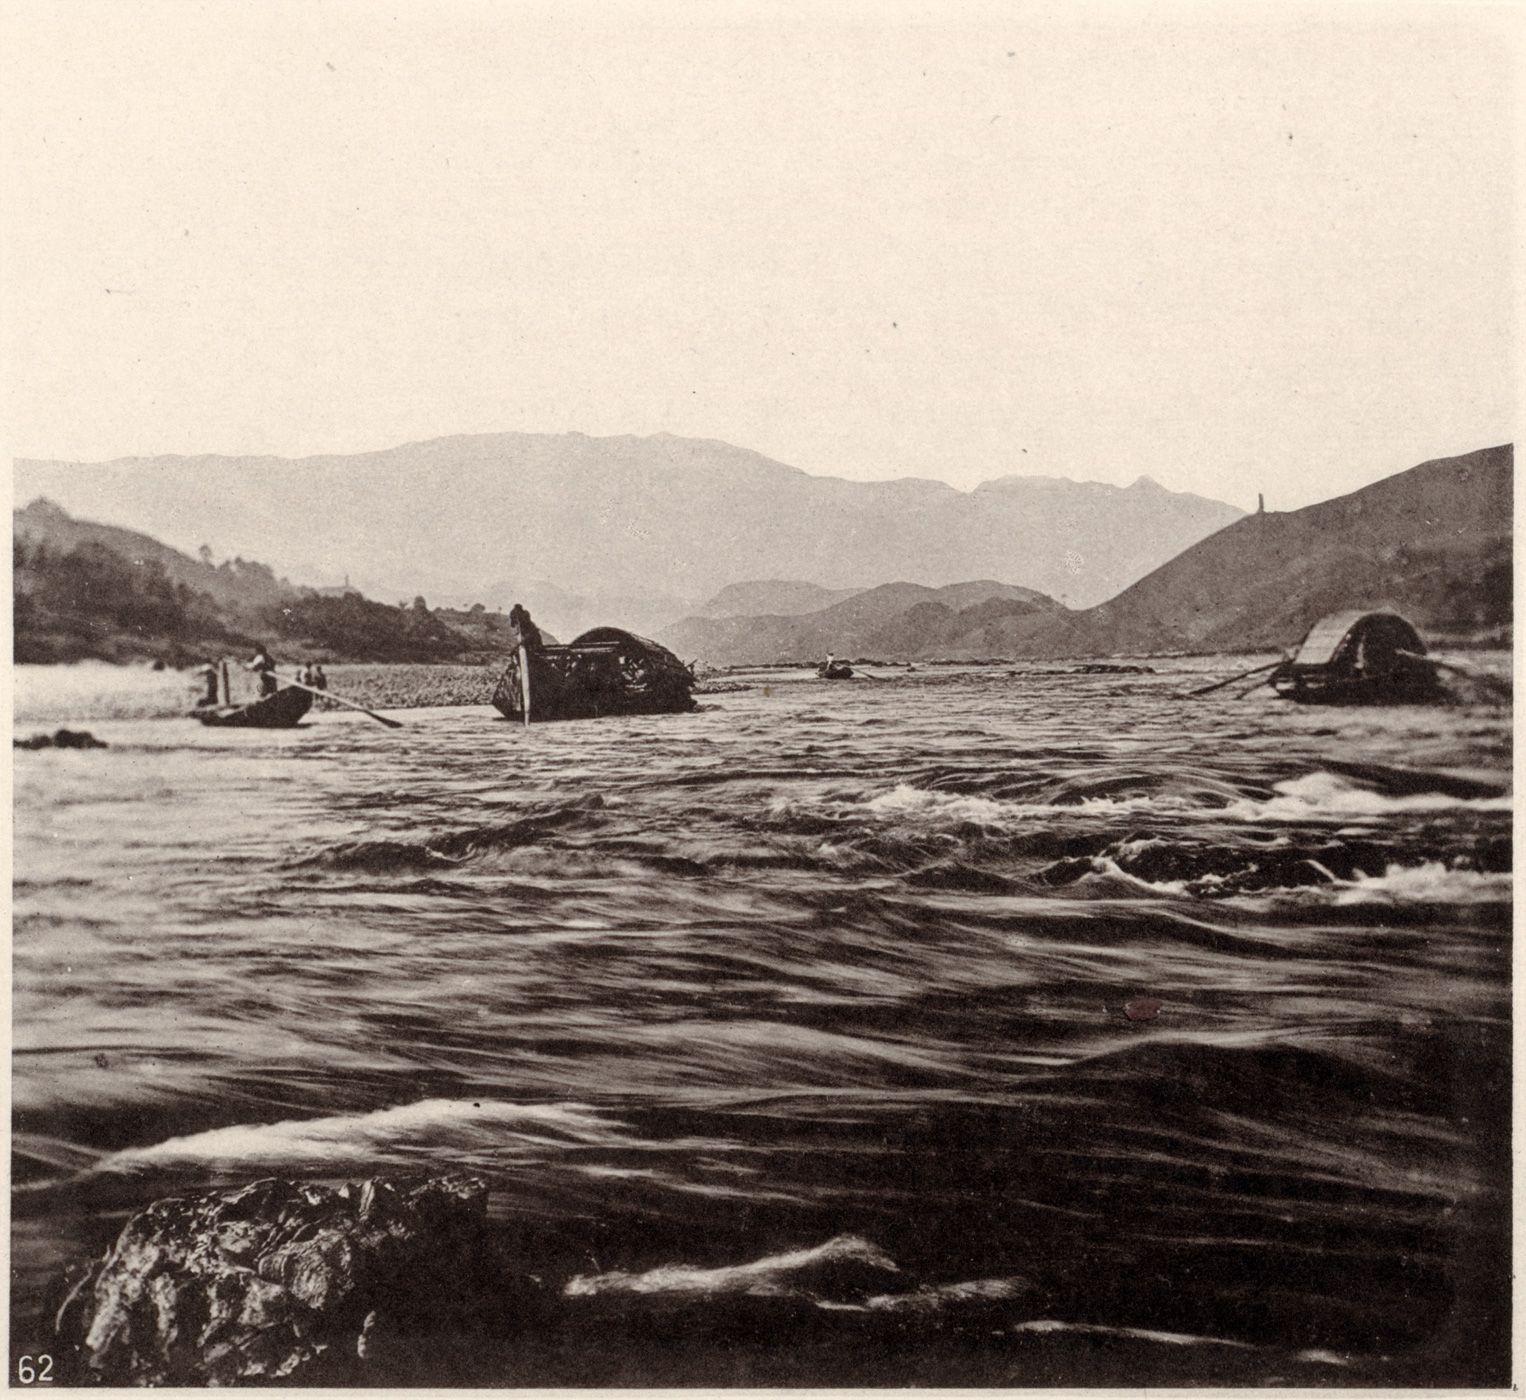 The Yanping Rapid on the Min river in Fujian province, ca 1870. From John Thomson, Images of China (pub. 1873-4)  http://ocw.mit.edu/ans7870/21f/21f.027/john_thomson_china_03/ct_gal_02_thumb.html